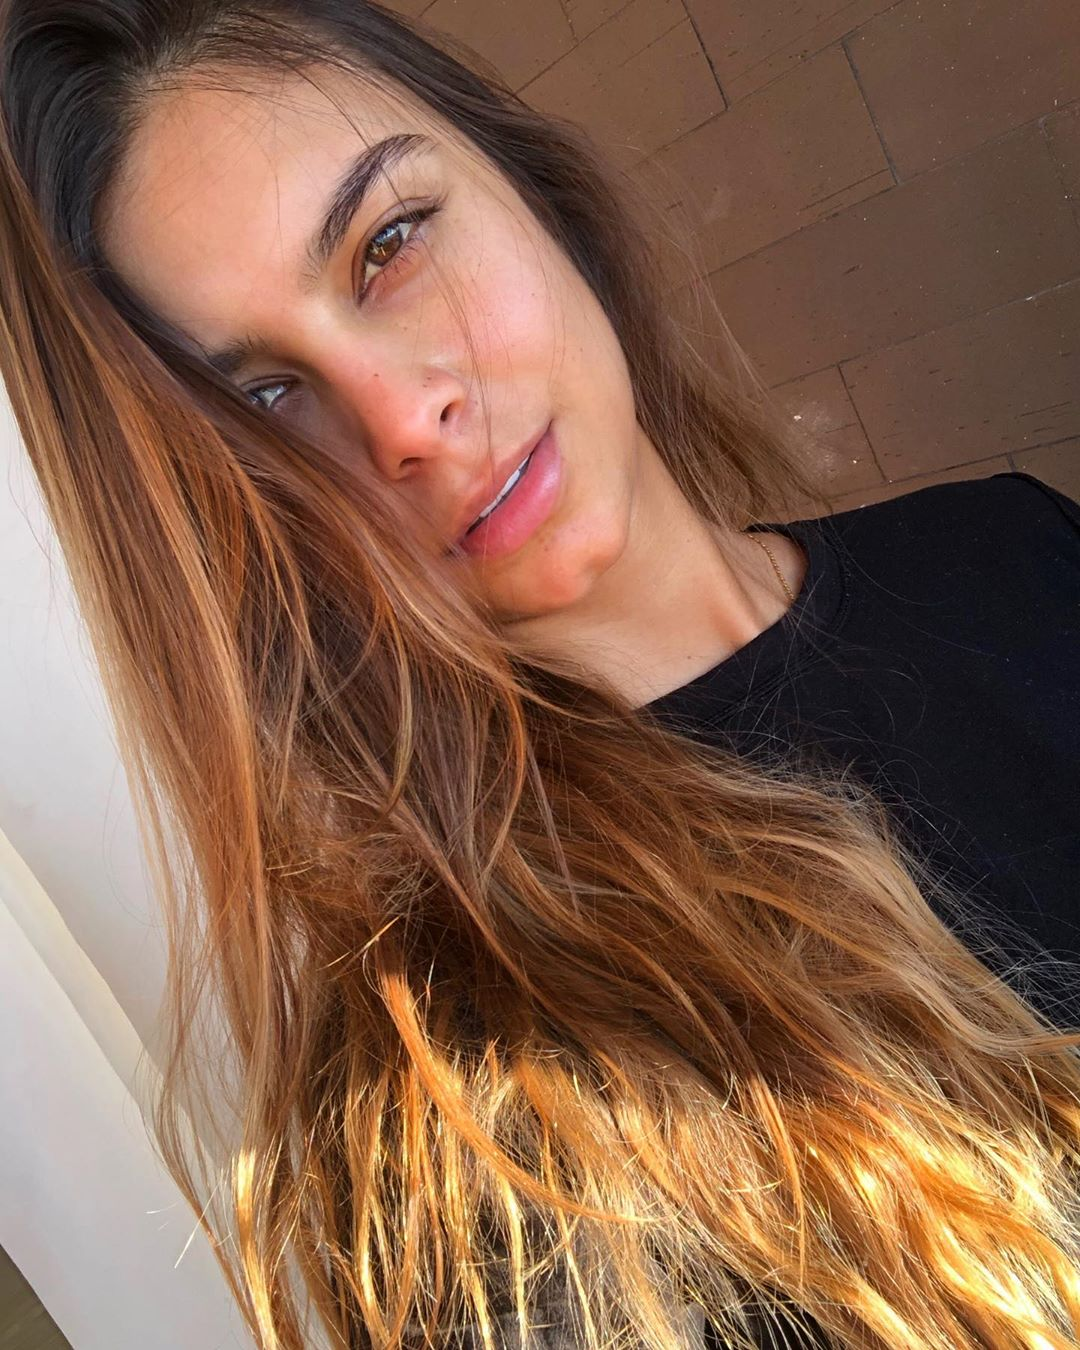 Daniela-Medina-Wallpapers-Insta-FIt-Bio-3